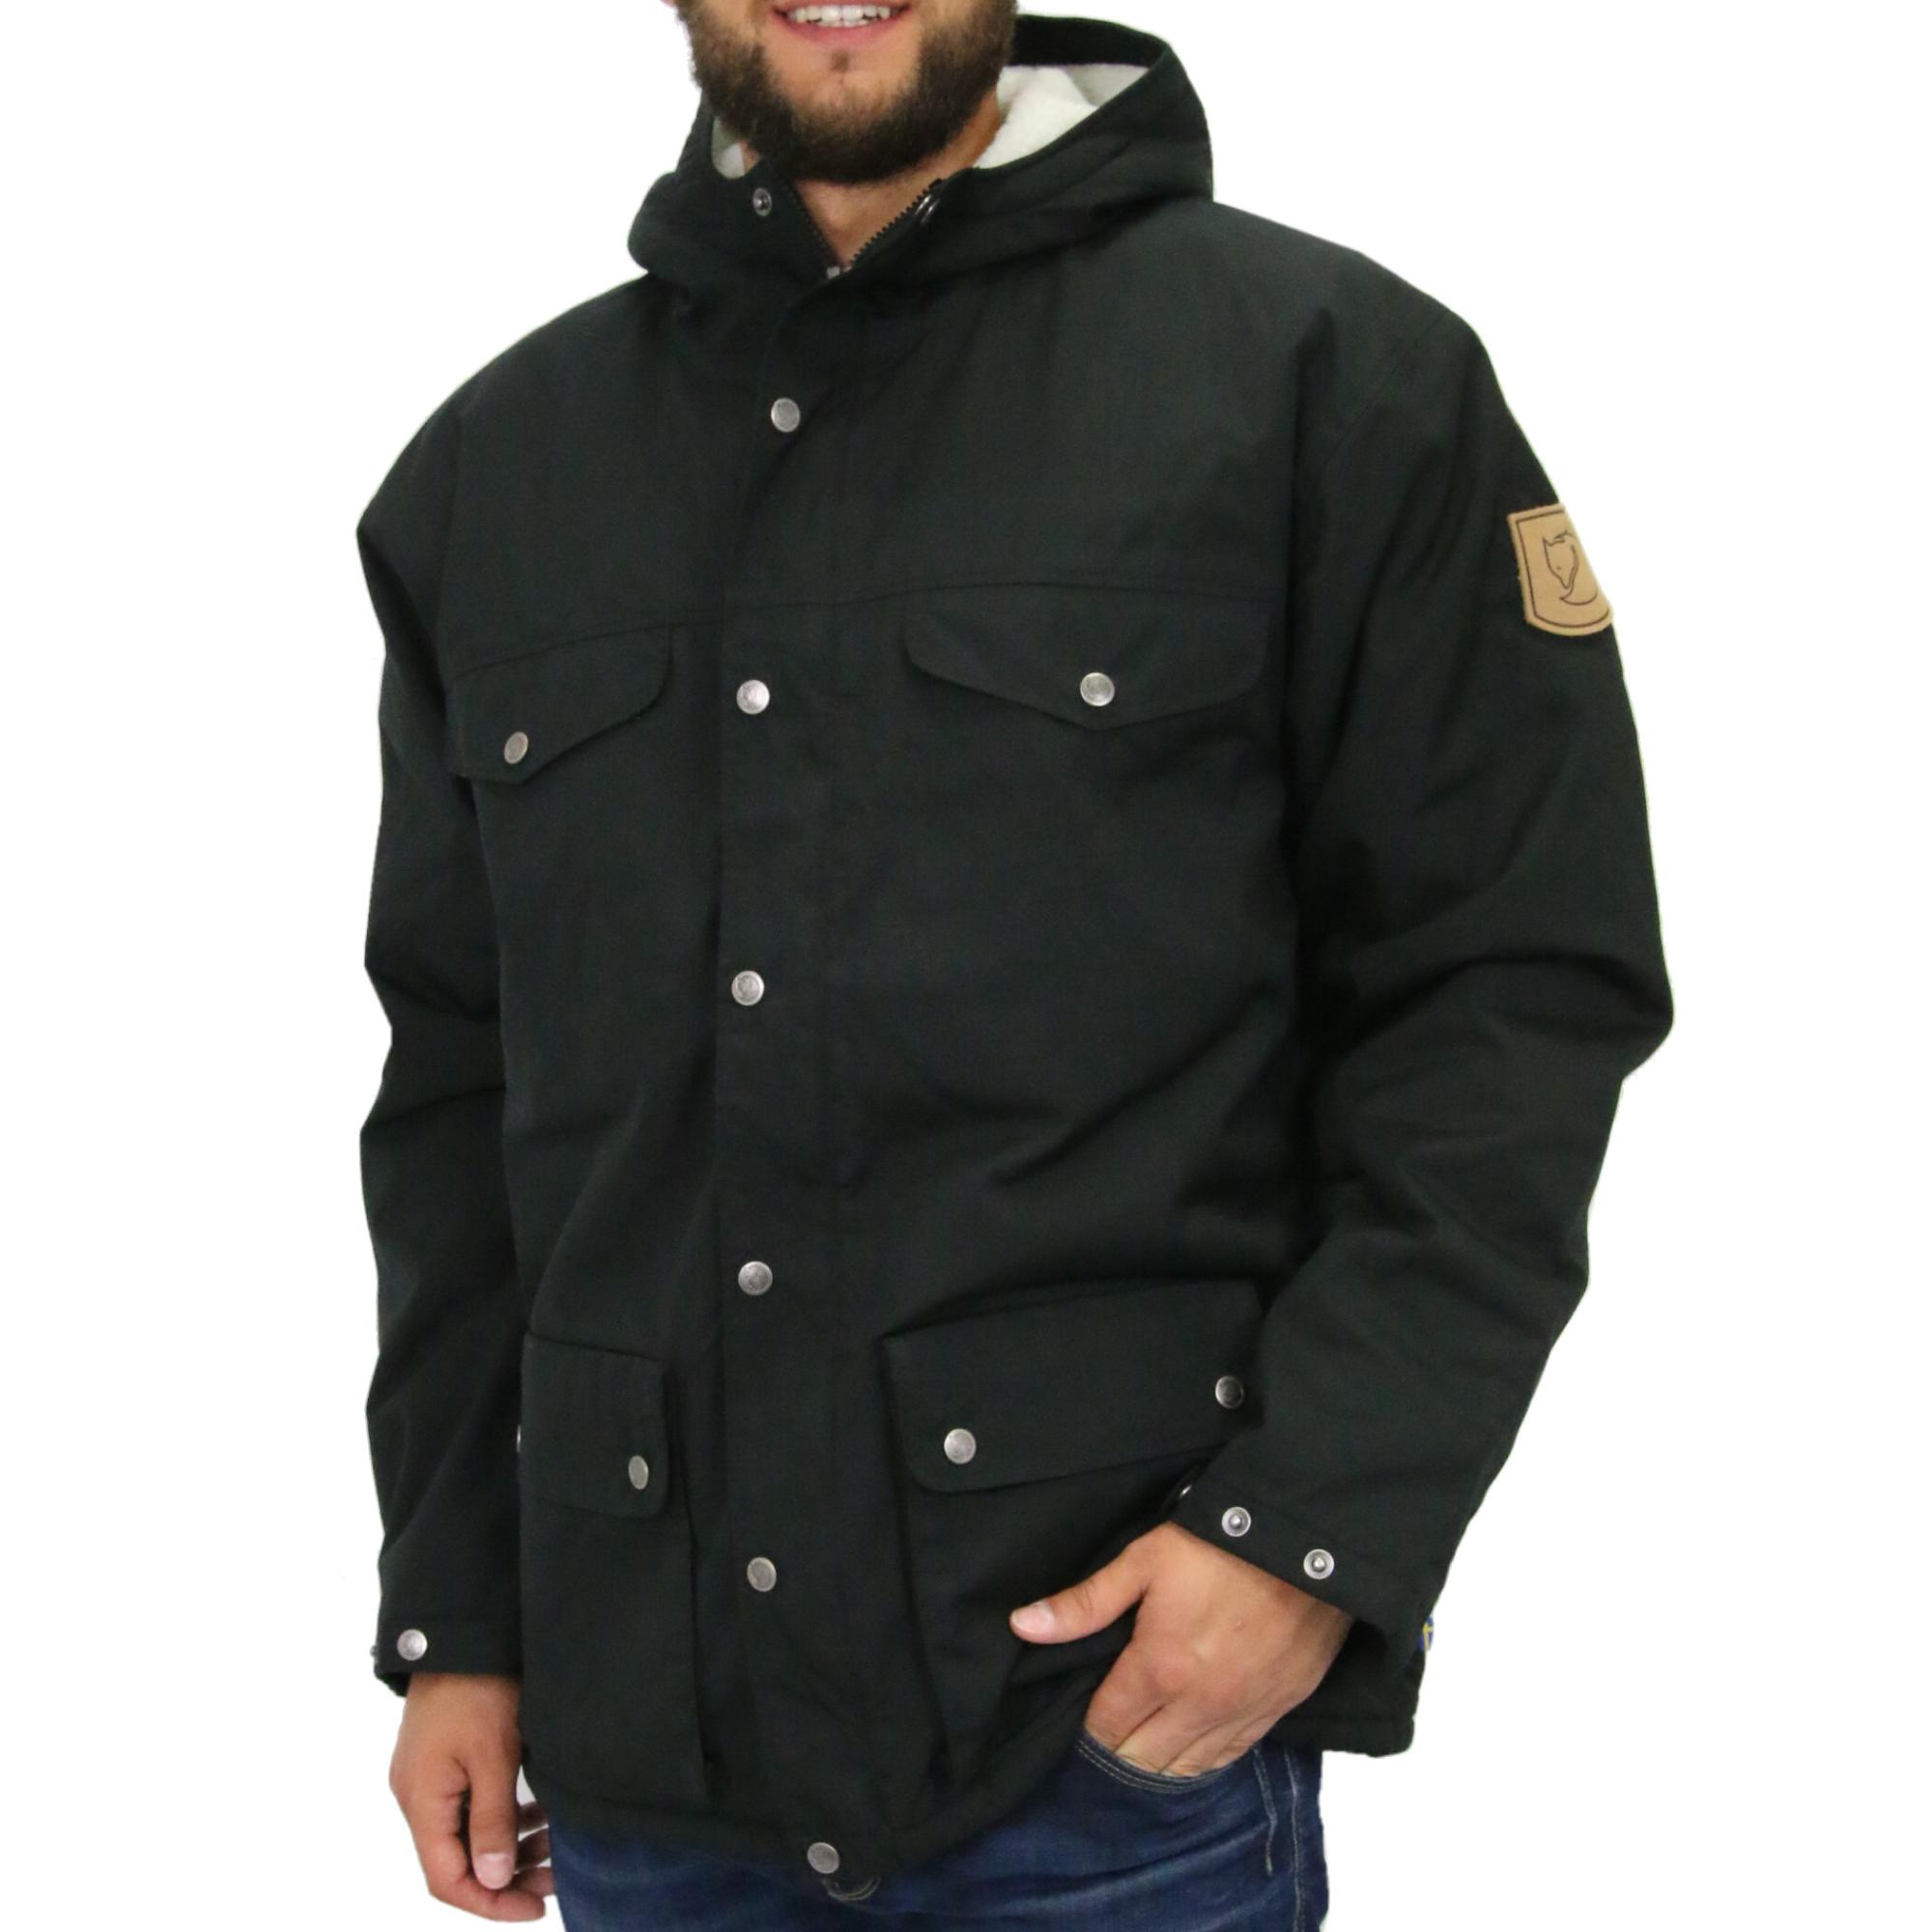 fj llr ven greenland winter jacket winterjacke outdoor. Black Bedroom Furniture Sets. Home Design Ideas